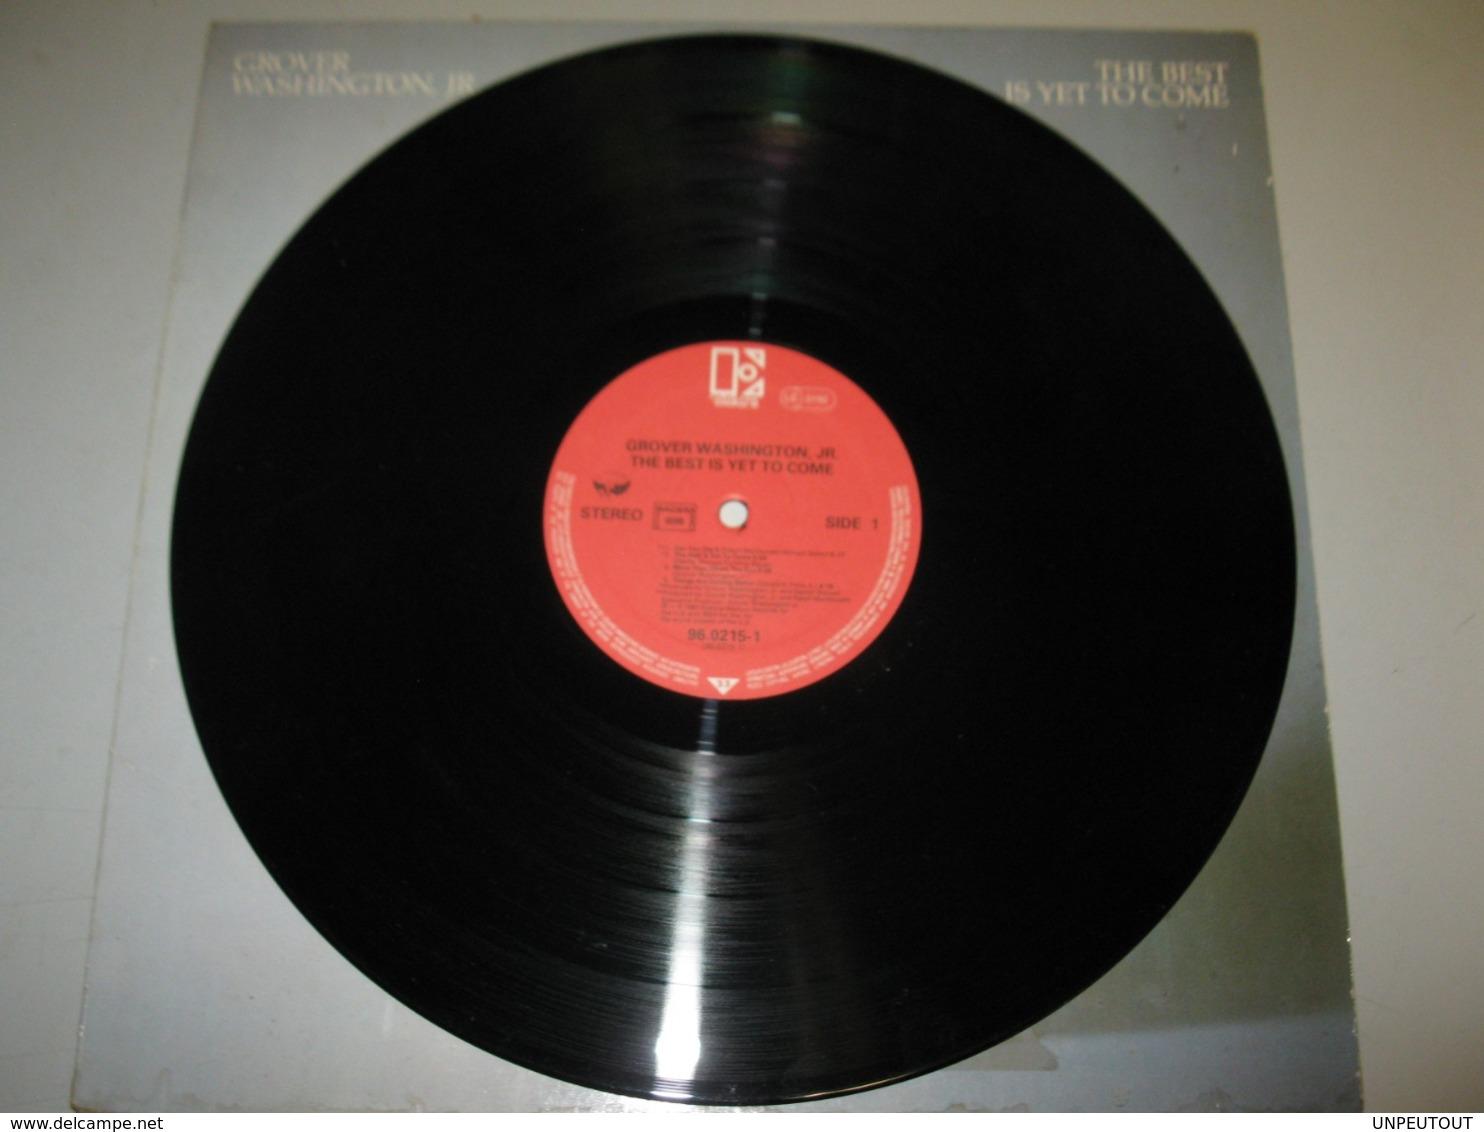 "VINYLE GROVER WASHINGTON JR ""THE BEST IS YET TO COME"" 33 T ELEKTRA / ASYLUM (1982) - Vinyl Records"